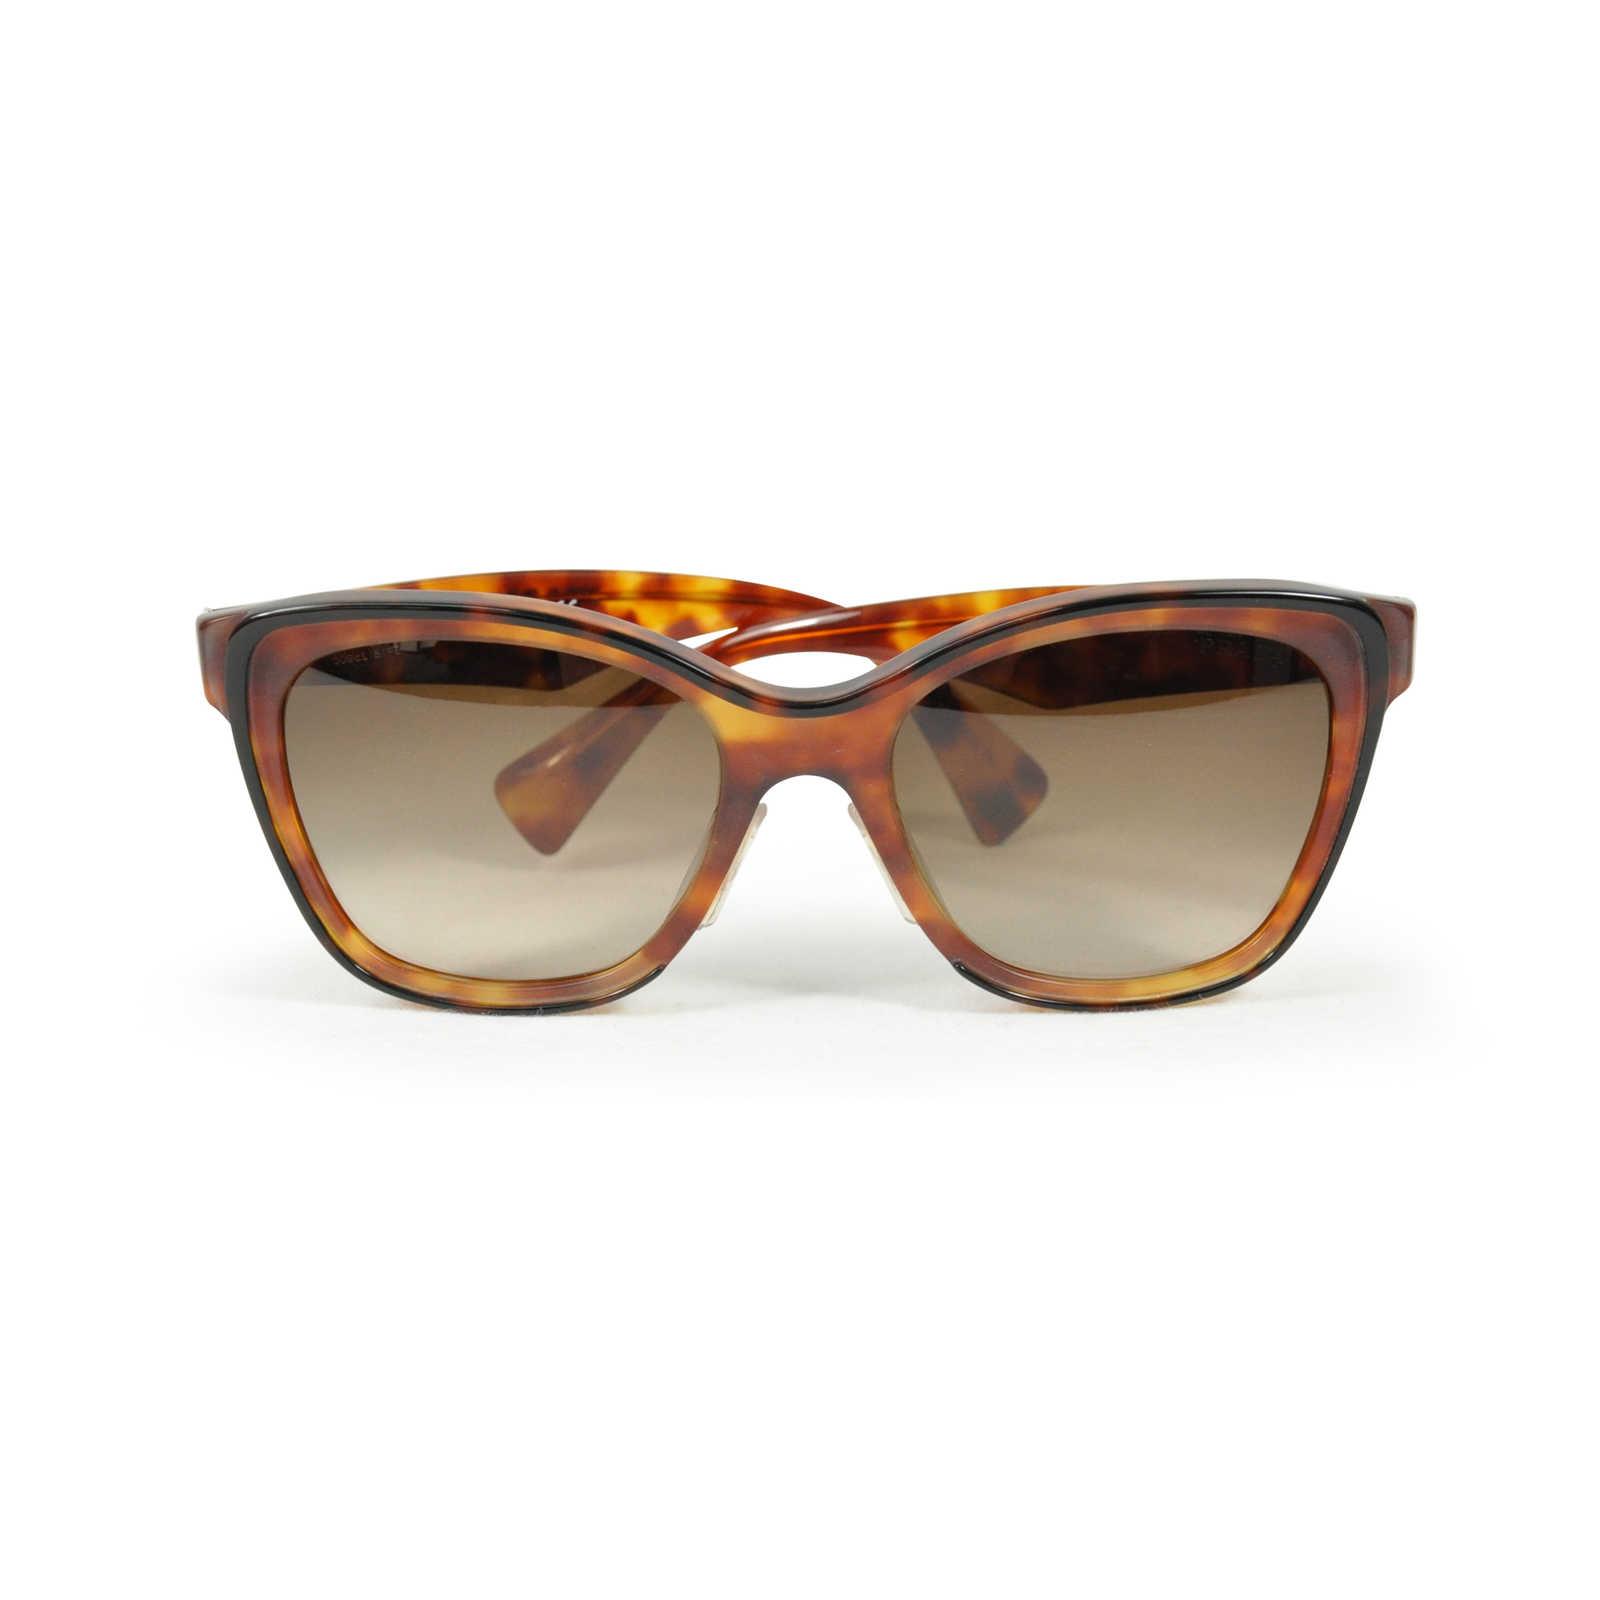 26c6fb7dacd ... Authentic Second Hand Prada Tortoise Shell Sunglasses (PSS-200-00376) -  Thumbnail ...